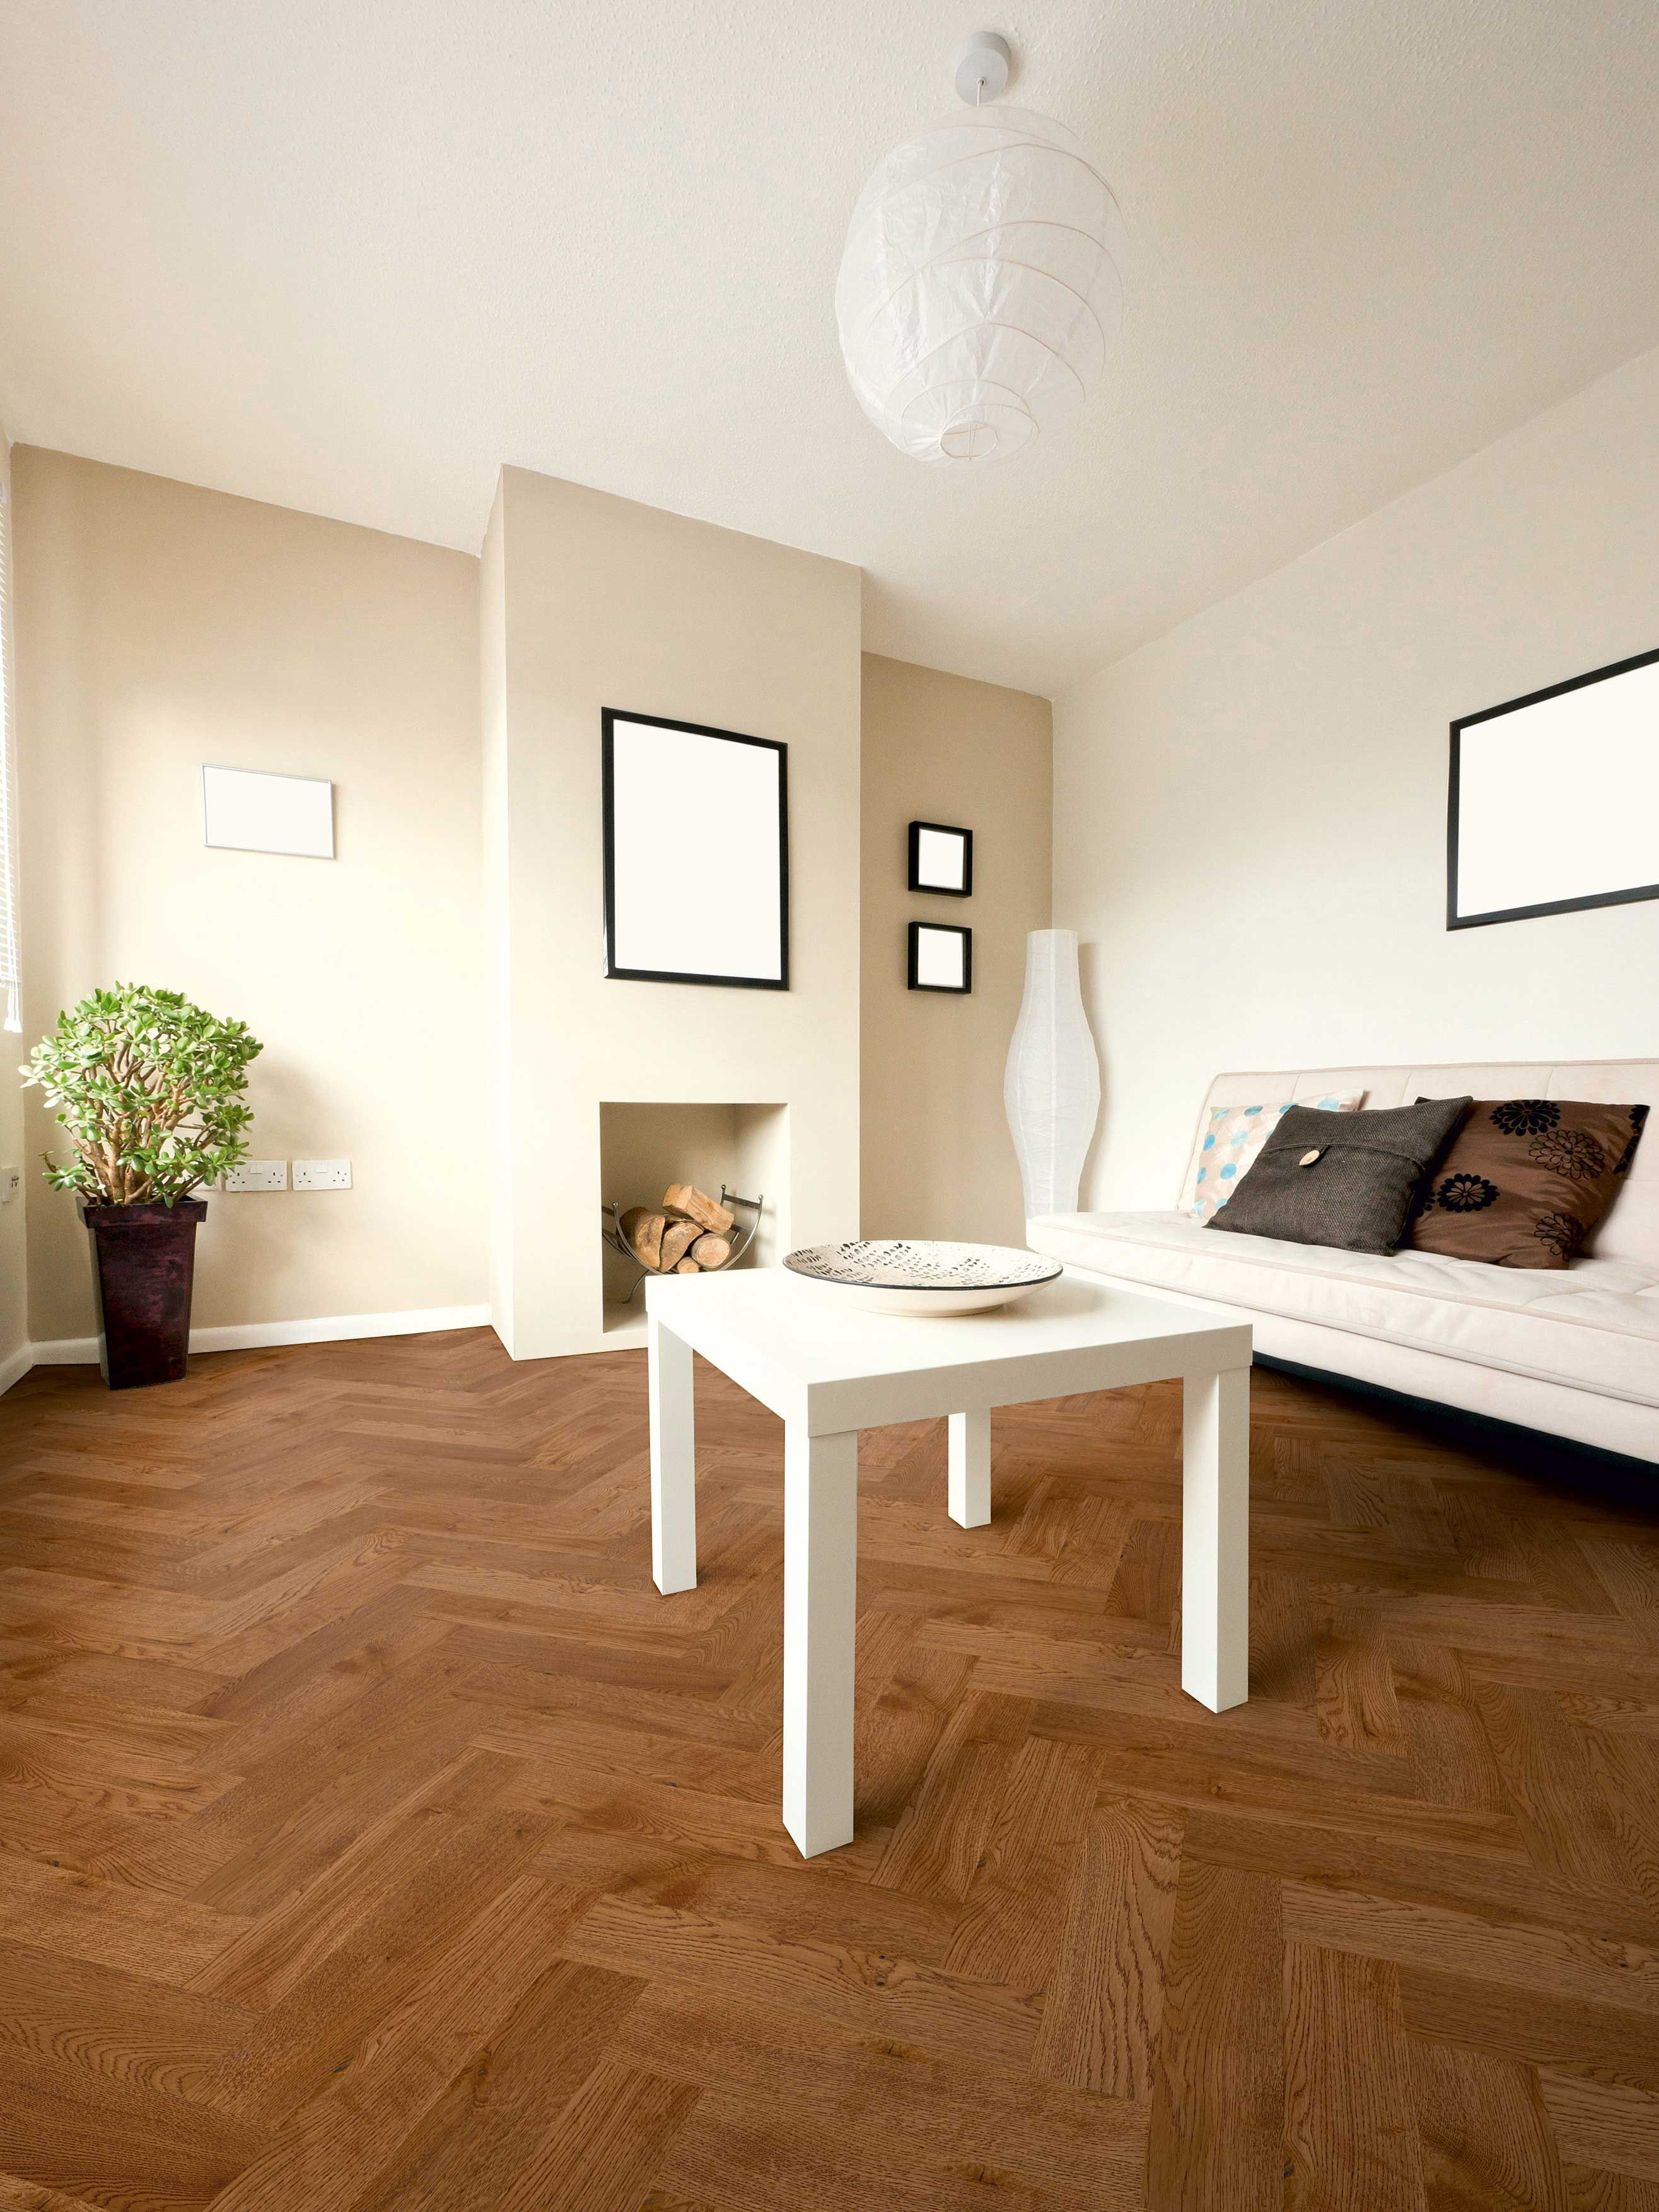 Goodrich Coffee Oak Wood parquet flooring, Herringbone